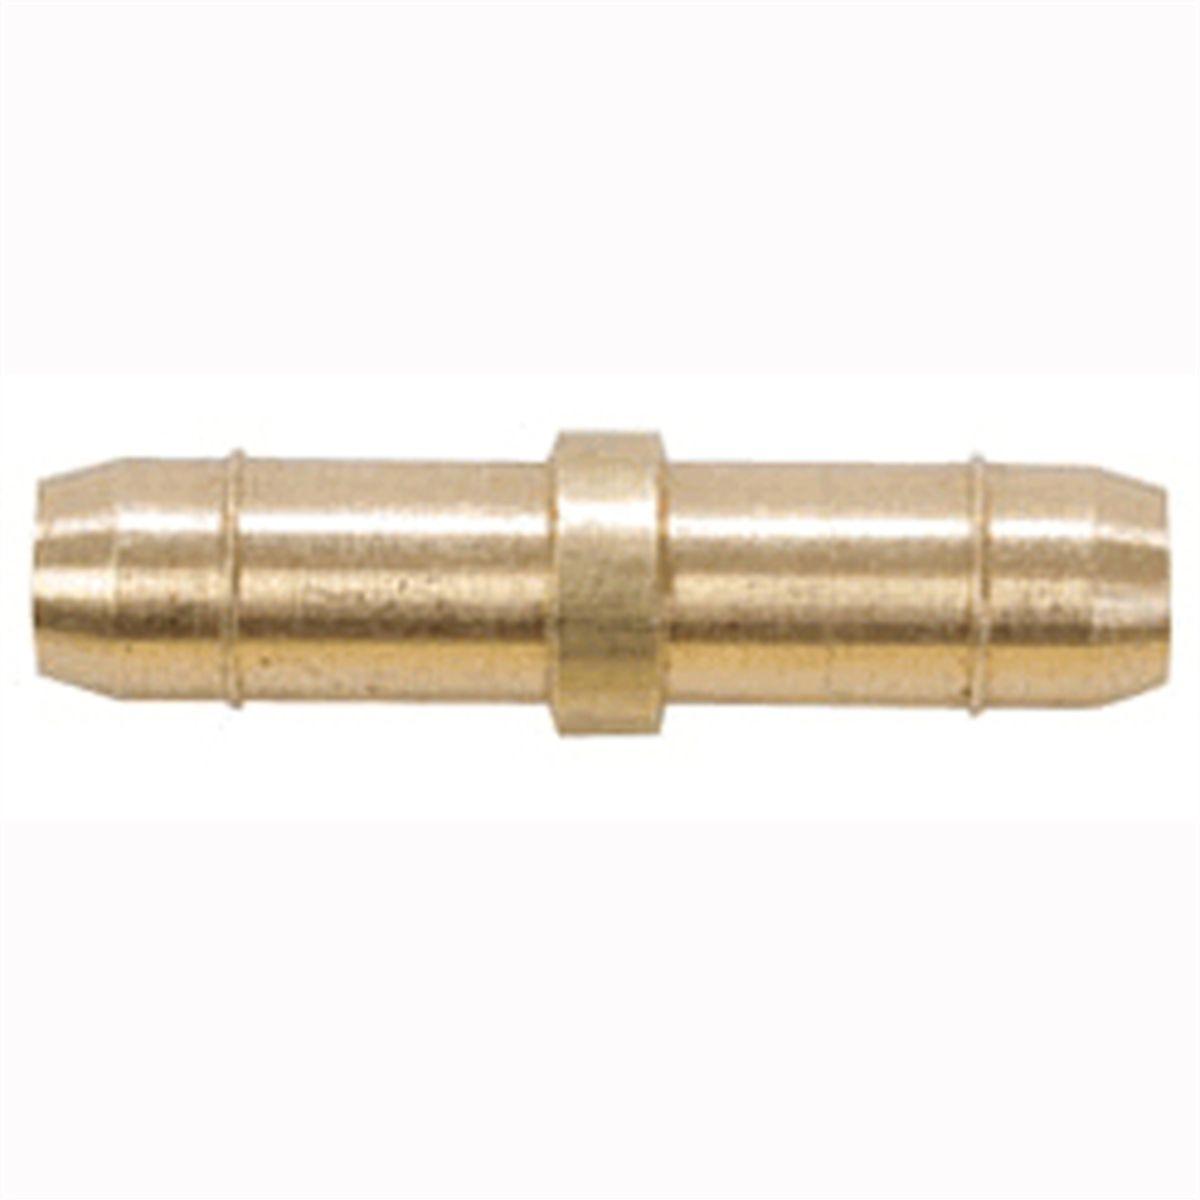 S.U.R and R Auto Parts K005 Nylon Tubing